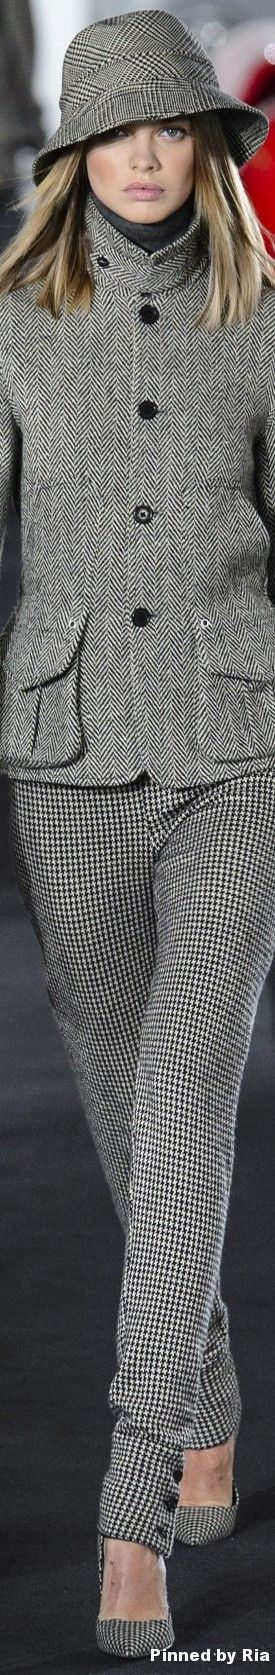 Ralph Lauren Fall 2017 Ready To Wear